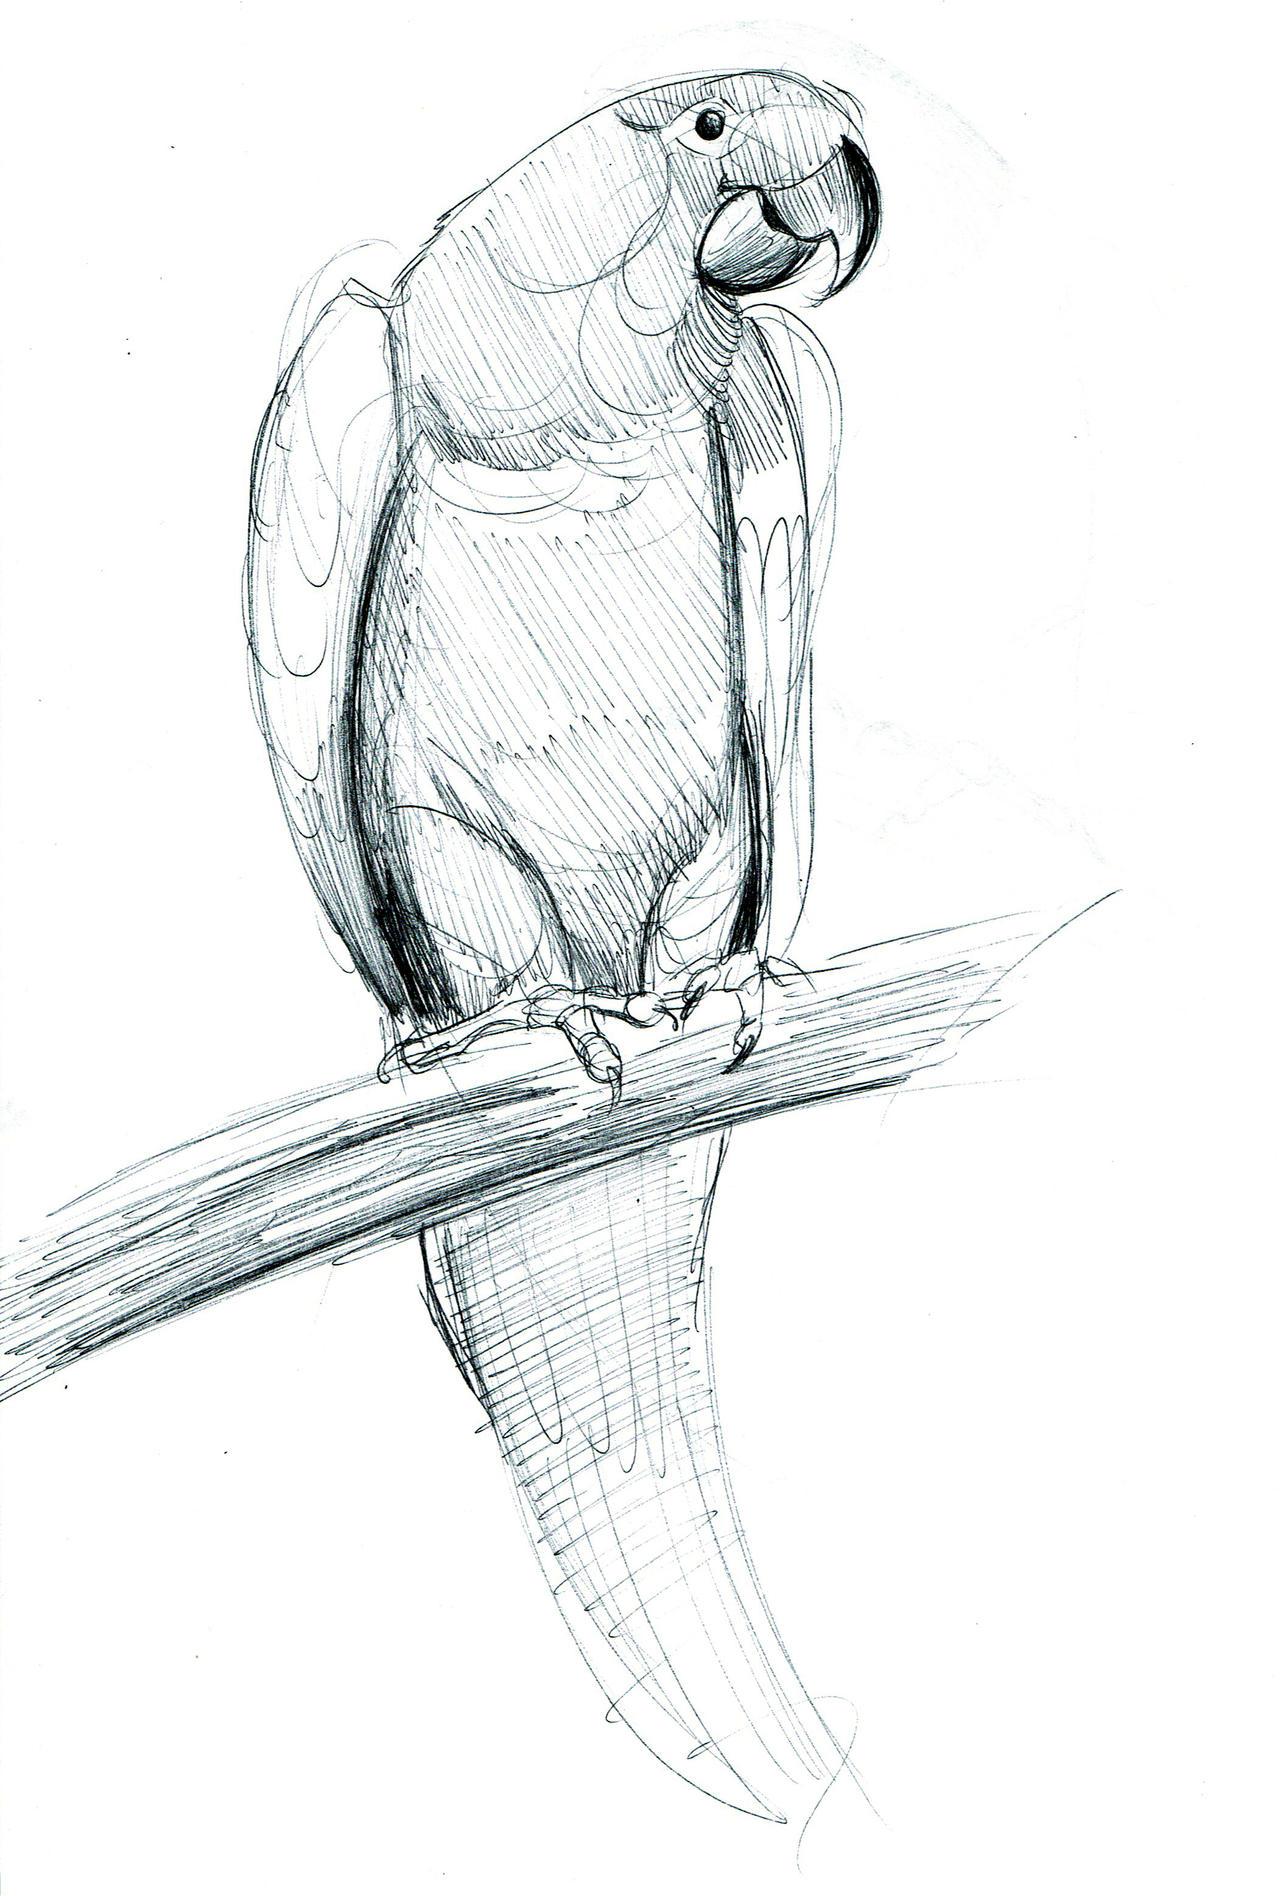 Parrot Sketch By Samarilla On Deviantart